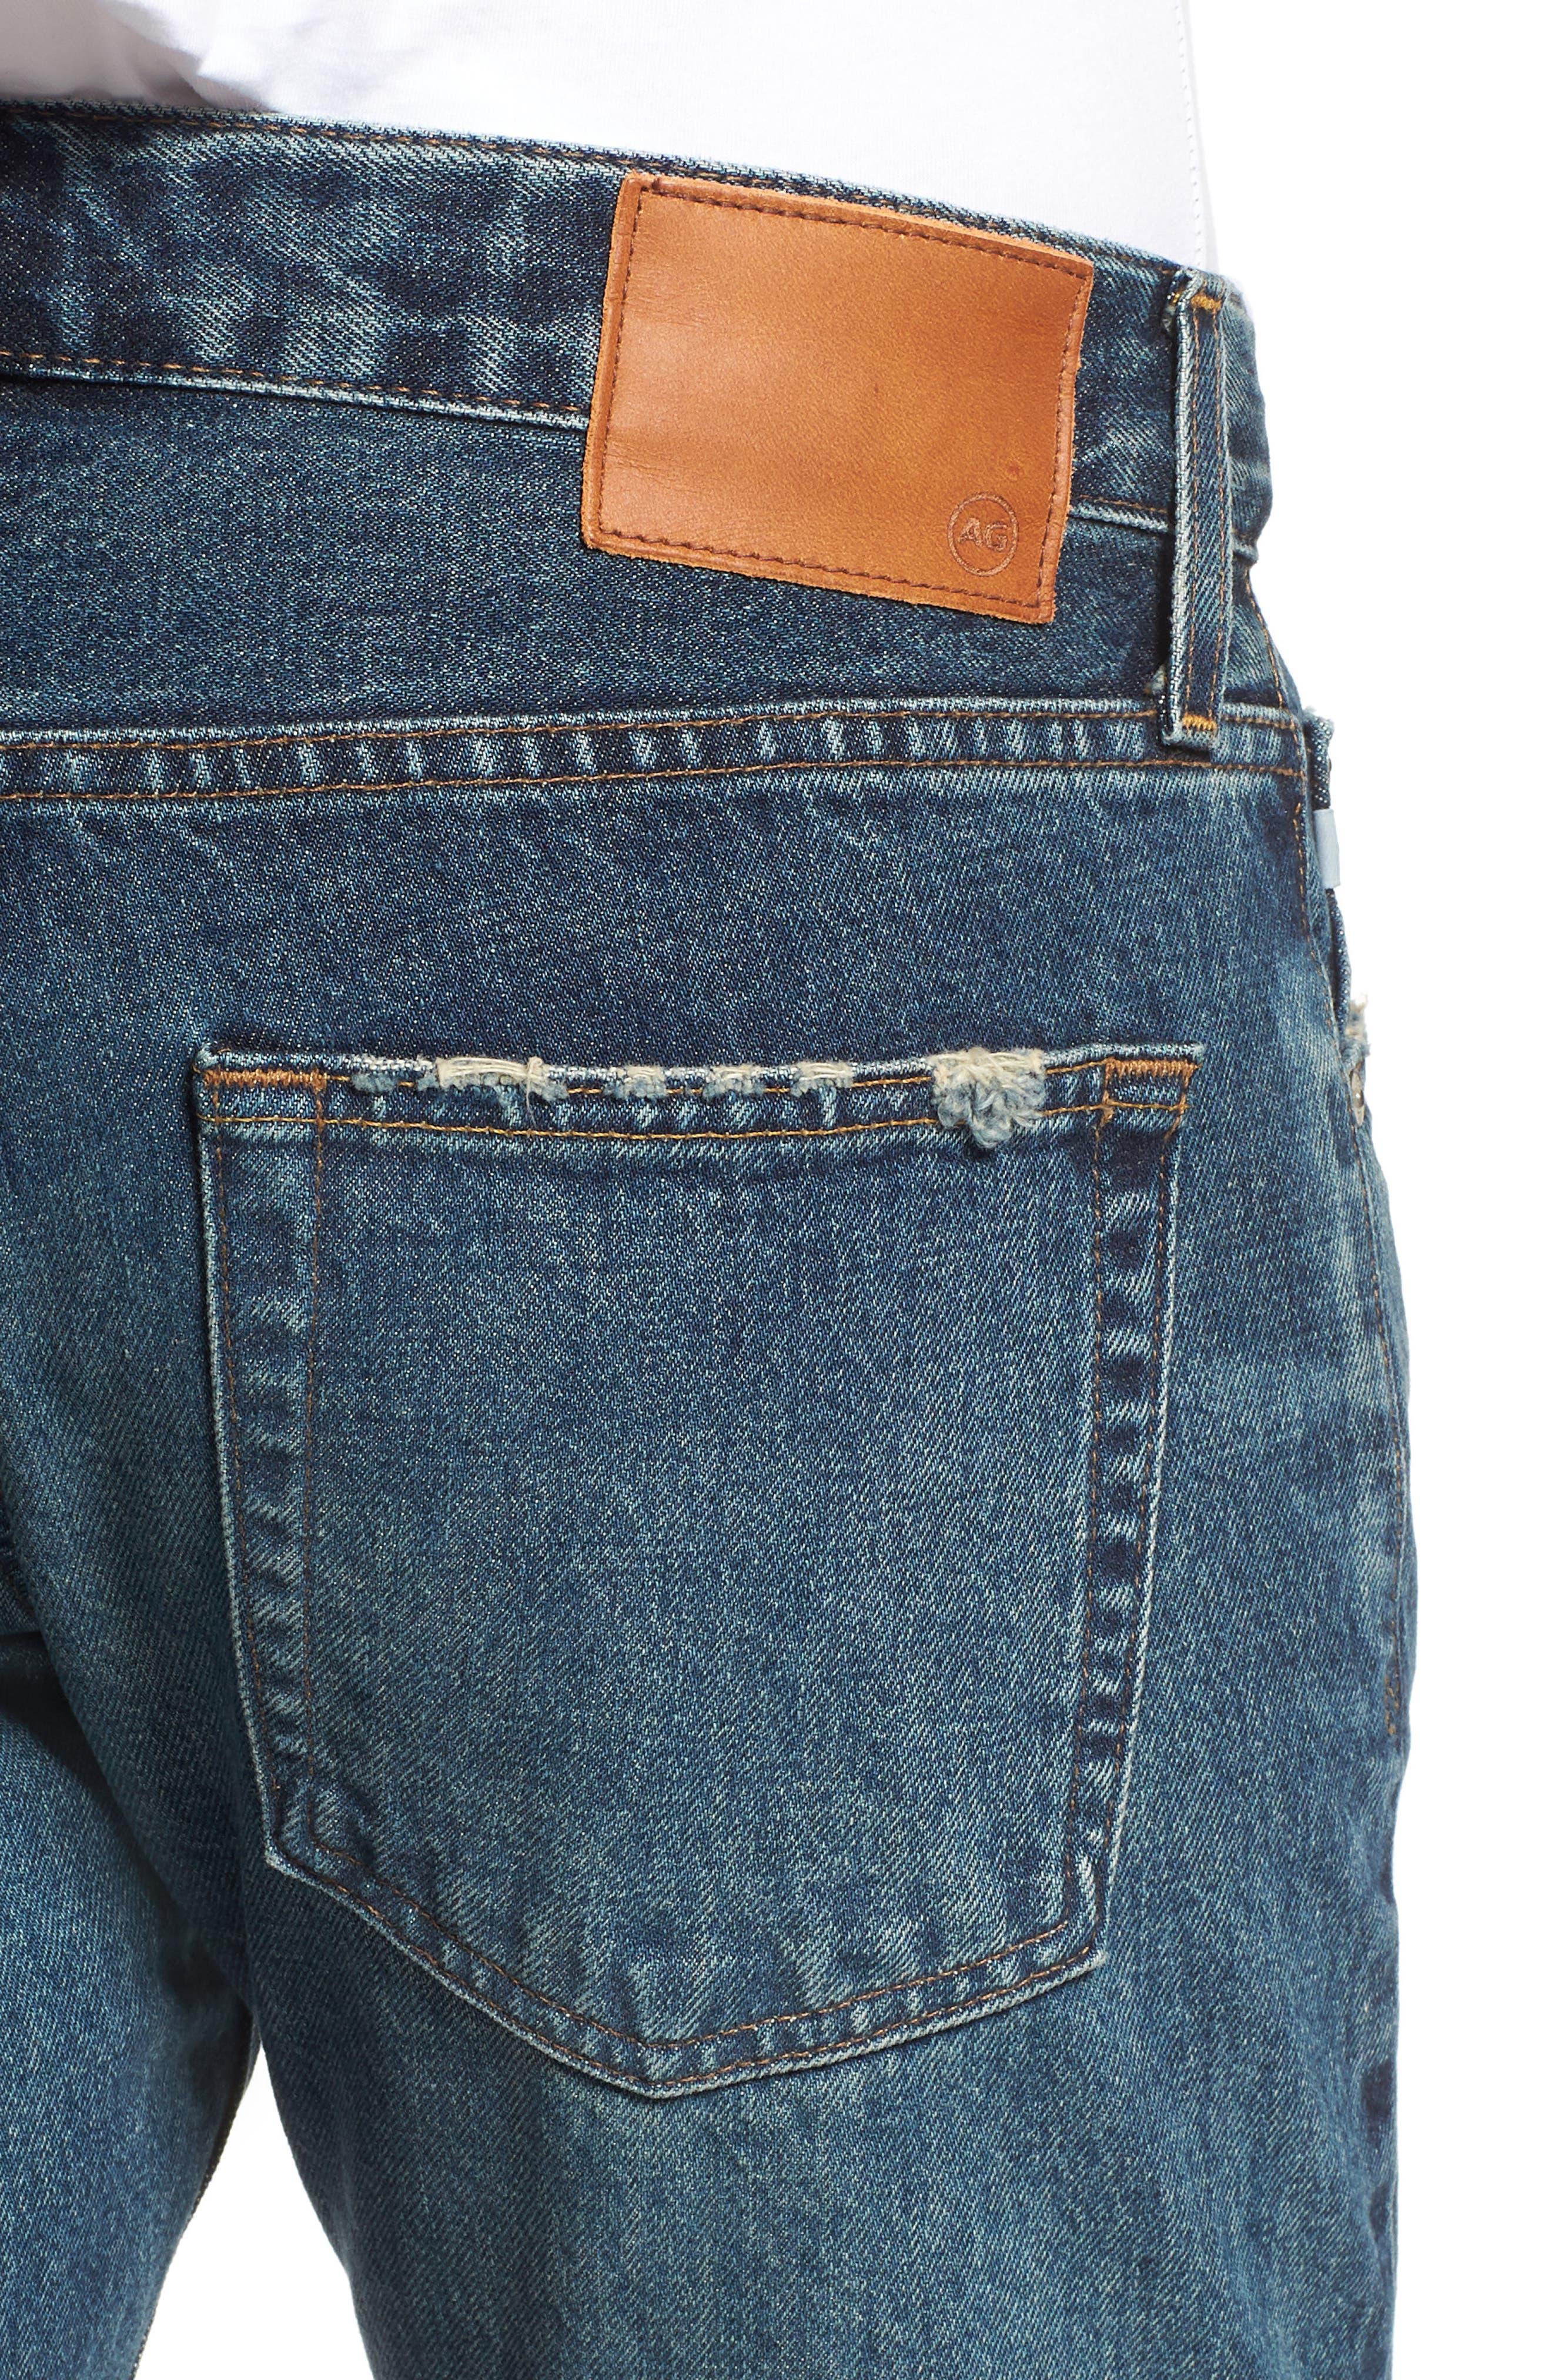 Tellis Slim Fit Jeans,                             Alternate thumbnail 4, color,                             417